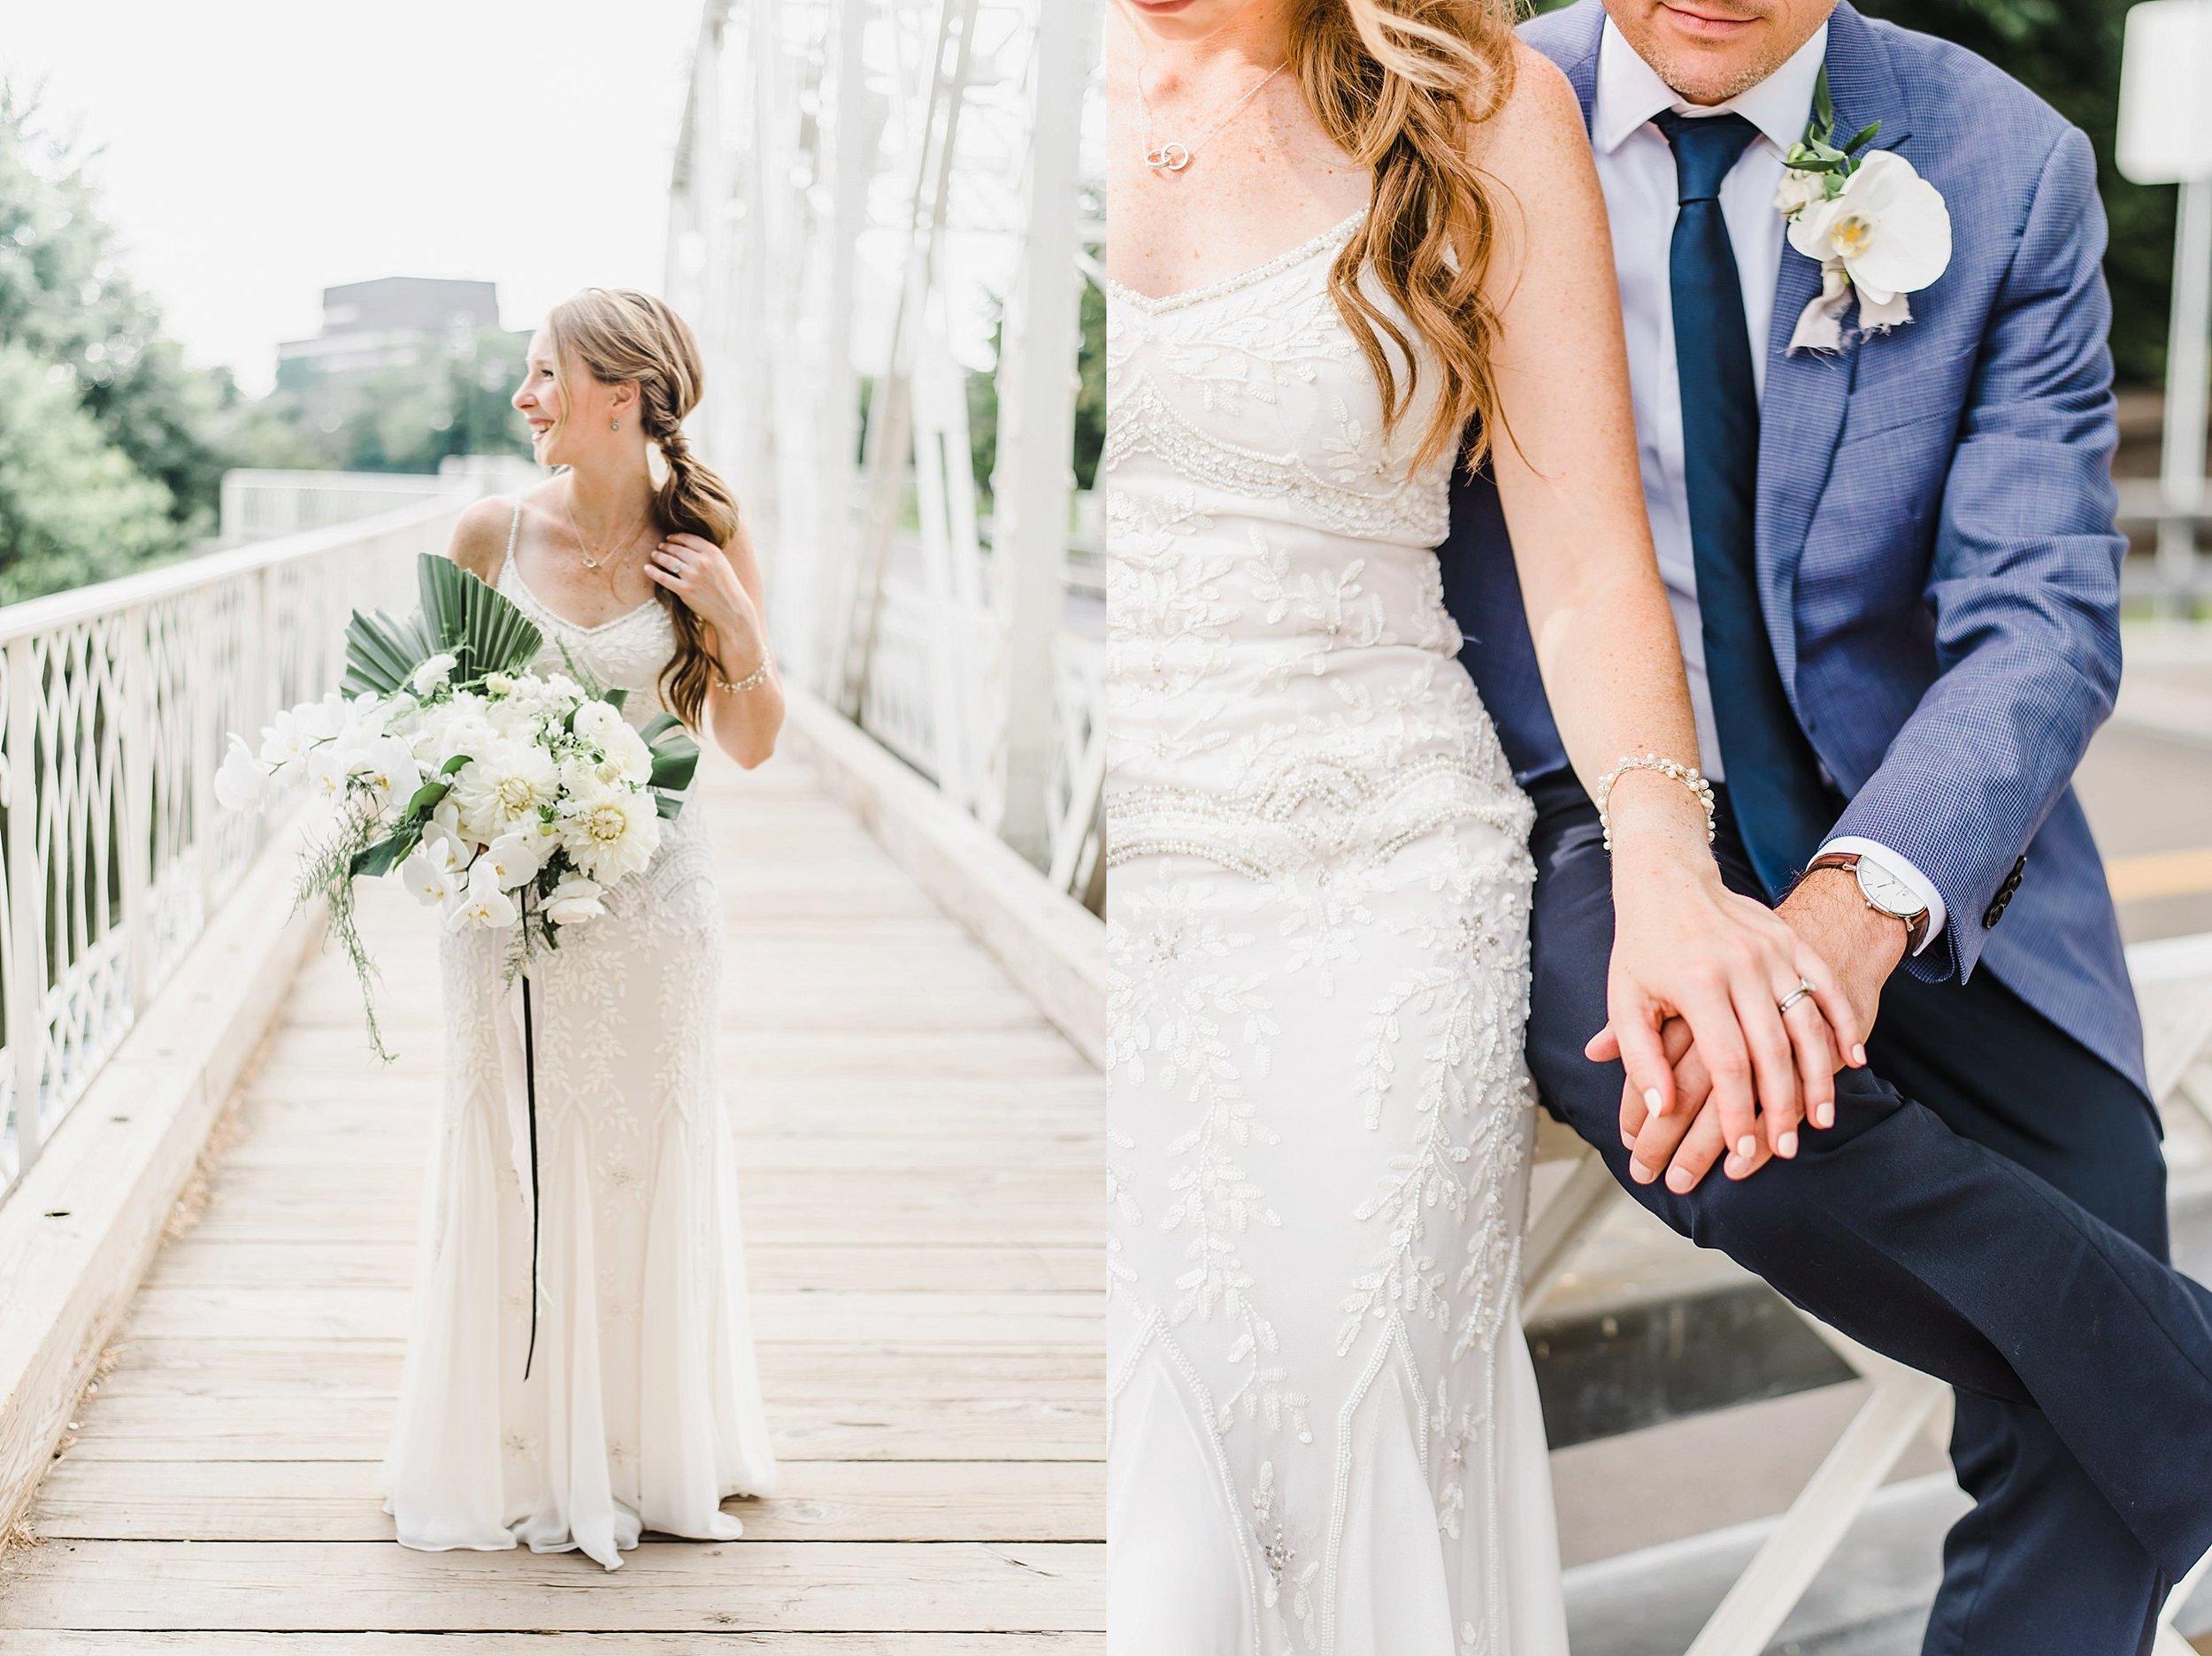 light airy indie fine art ottawa wedding photographer | Ali and Batoul Photography_0651.jpg